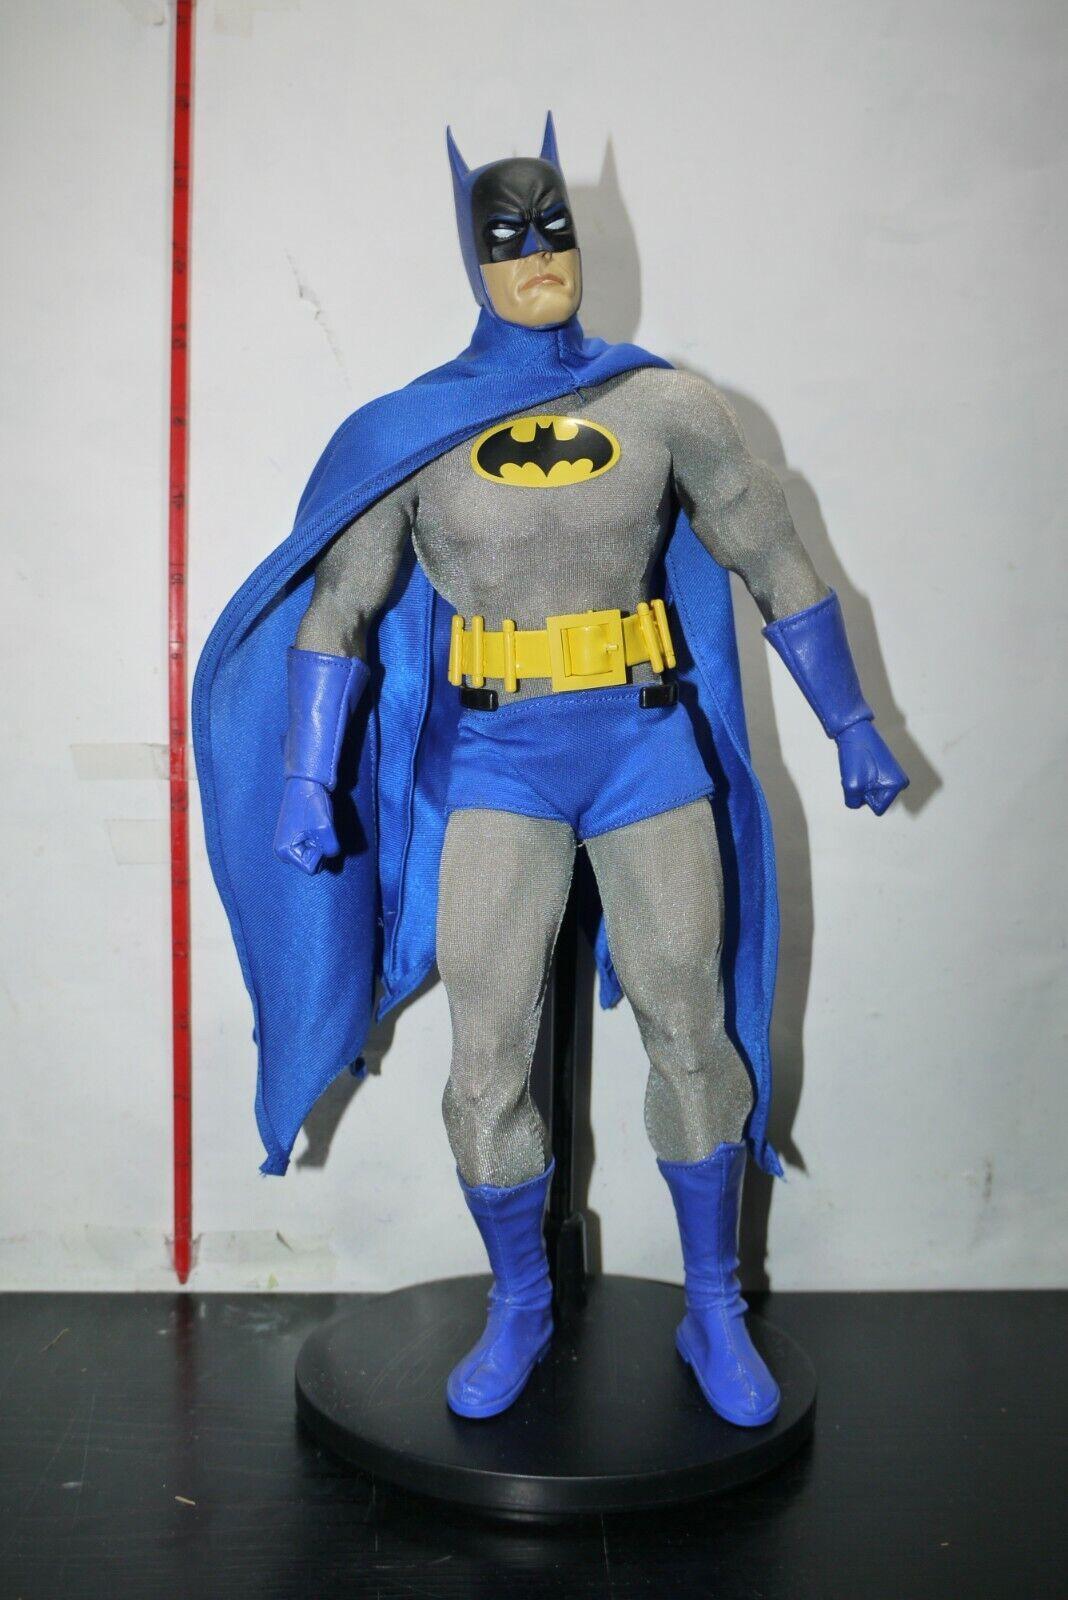 DC DIRECT 13 BATMAN CLASSIC DELUXE COLLECTOR FIGURE COMPLETE